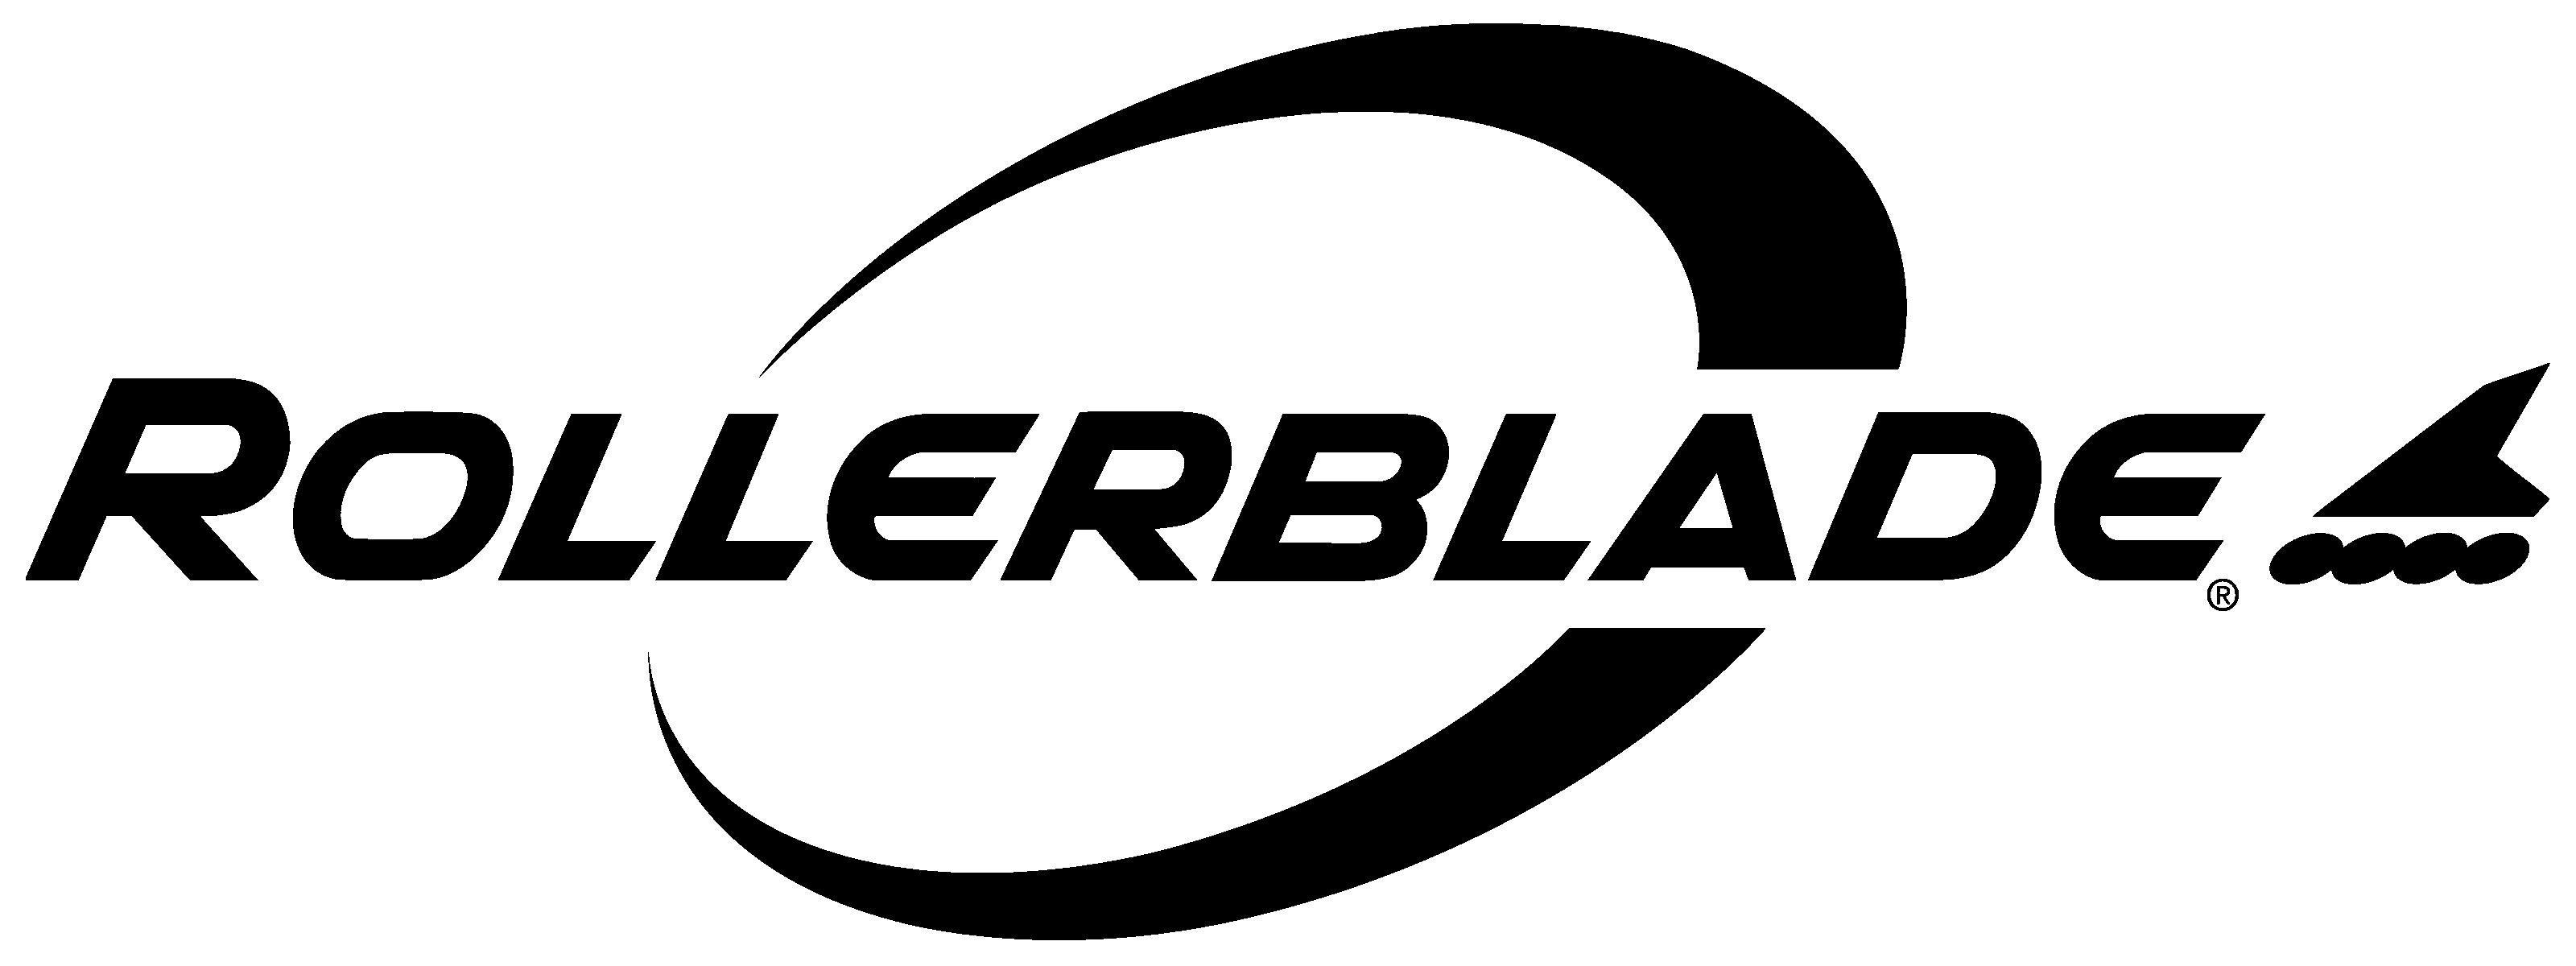 www.rollerblade.com | Rollerblade, Roller disco, List of brands